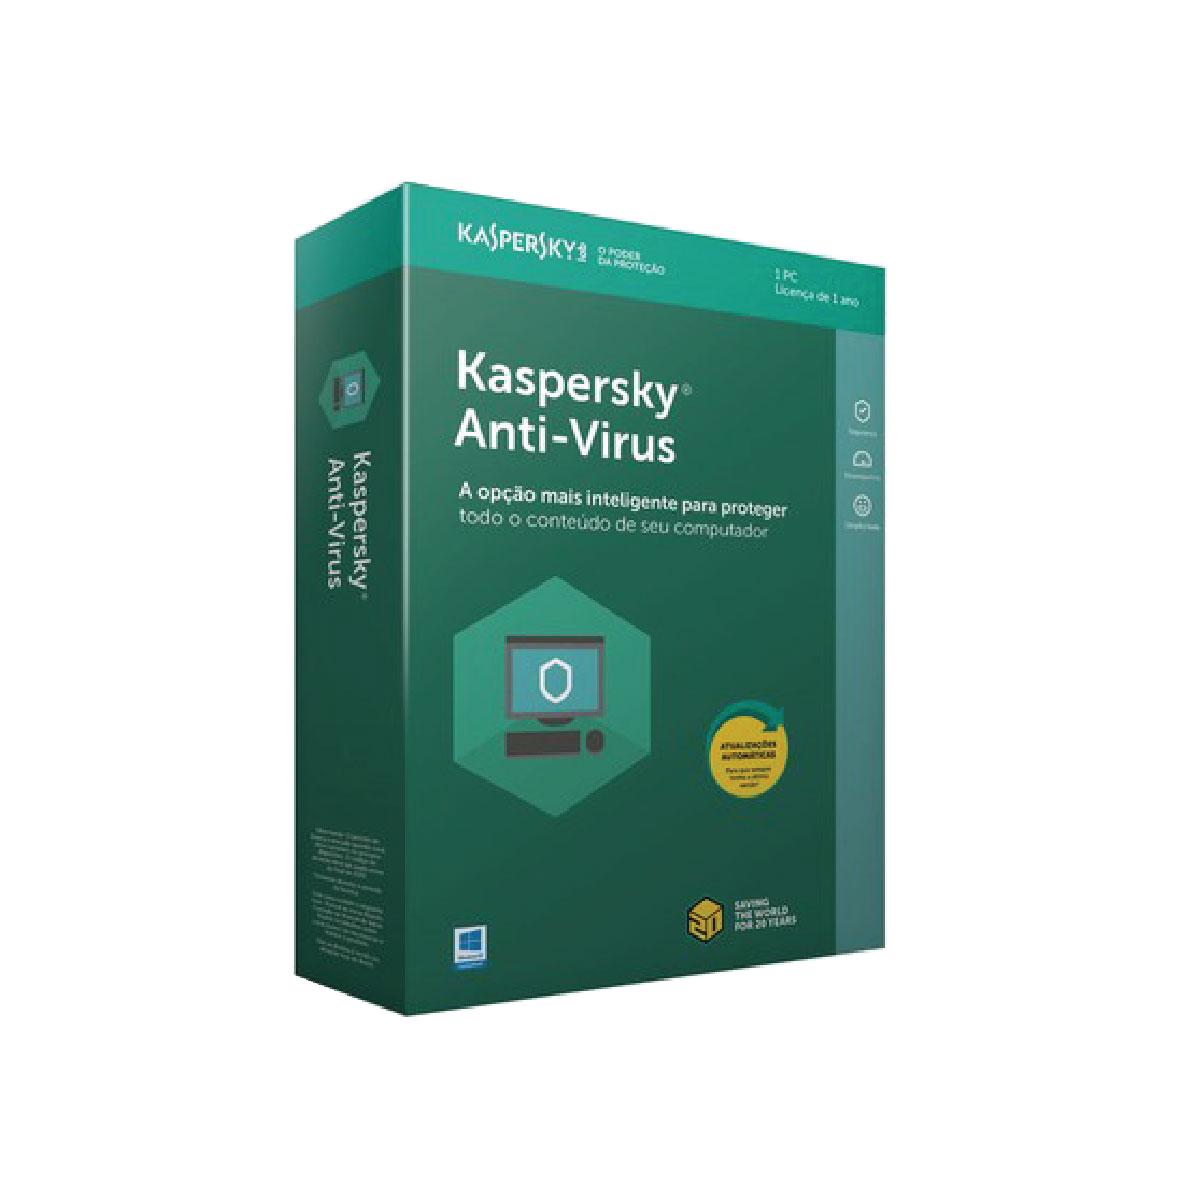 Antivirus Kaspersky